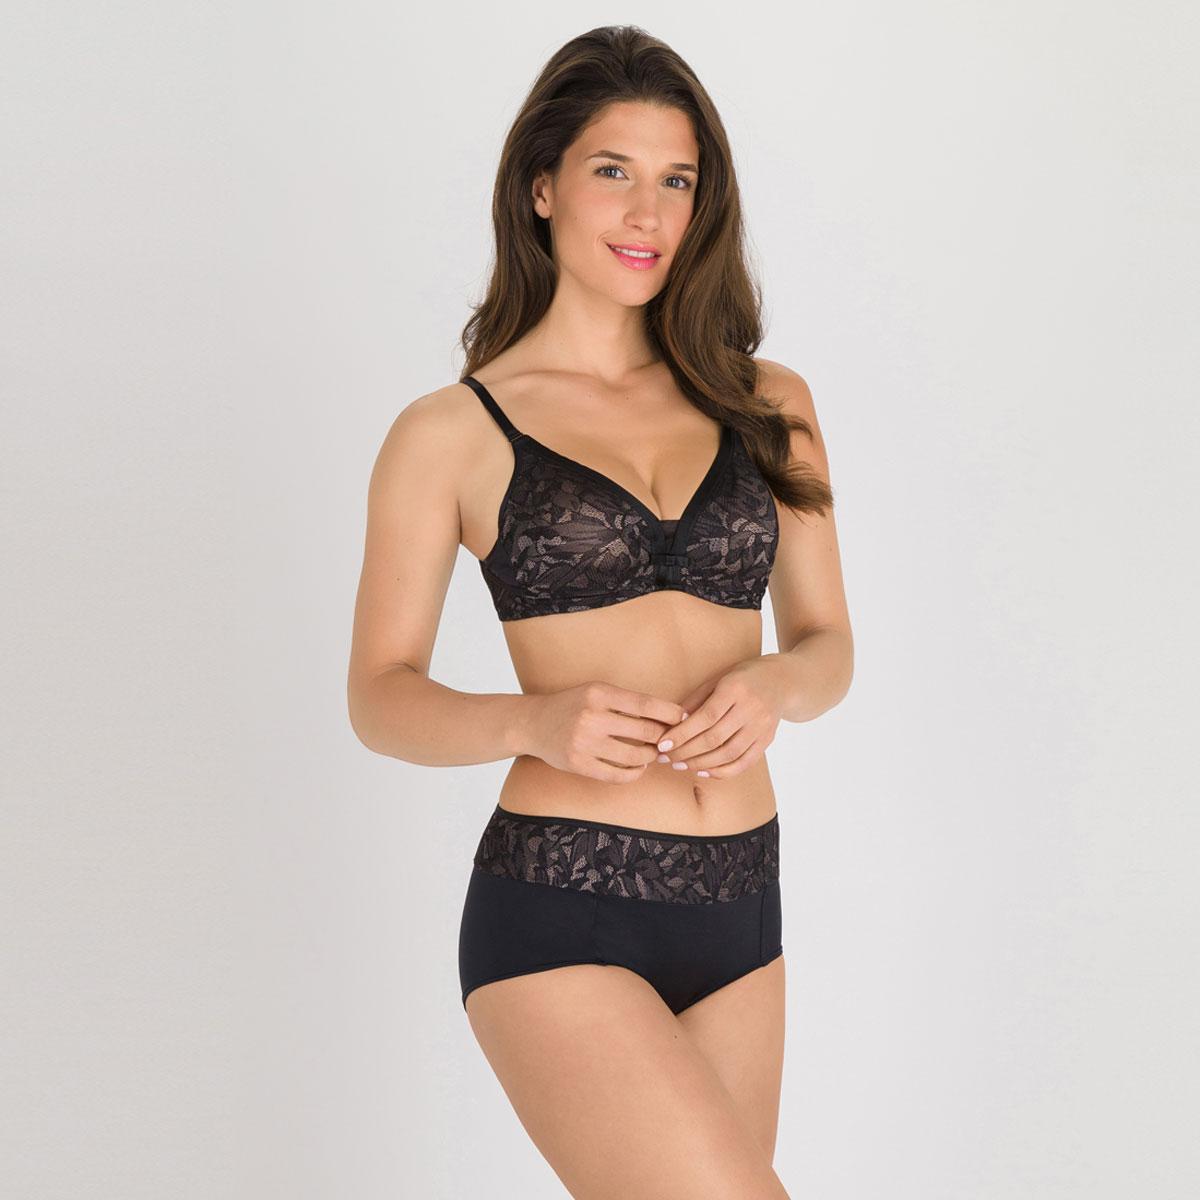 Shorty nero e grigio - Ideal Beauty Lace, , PLAYTEX